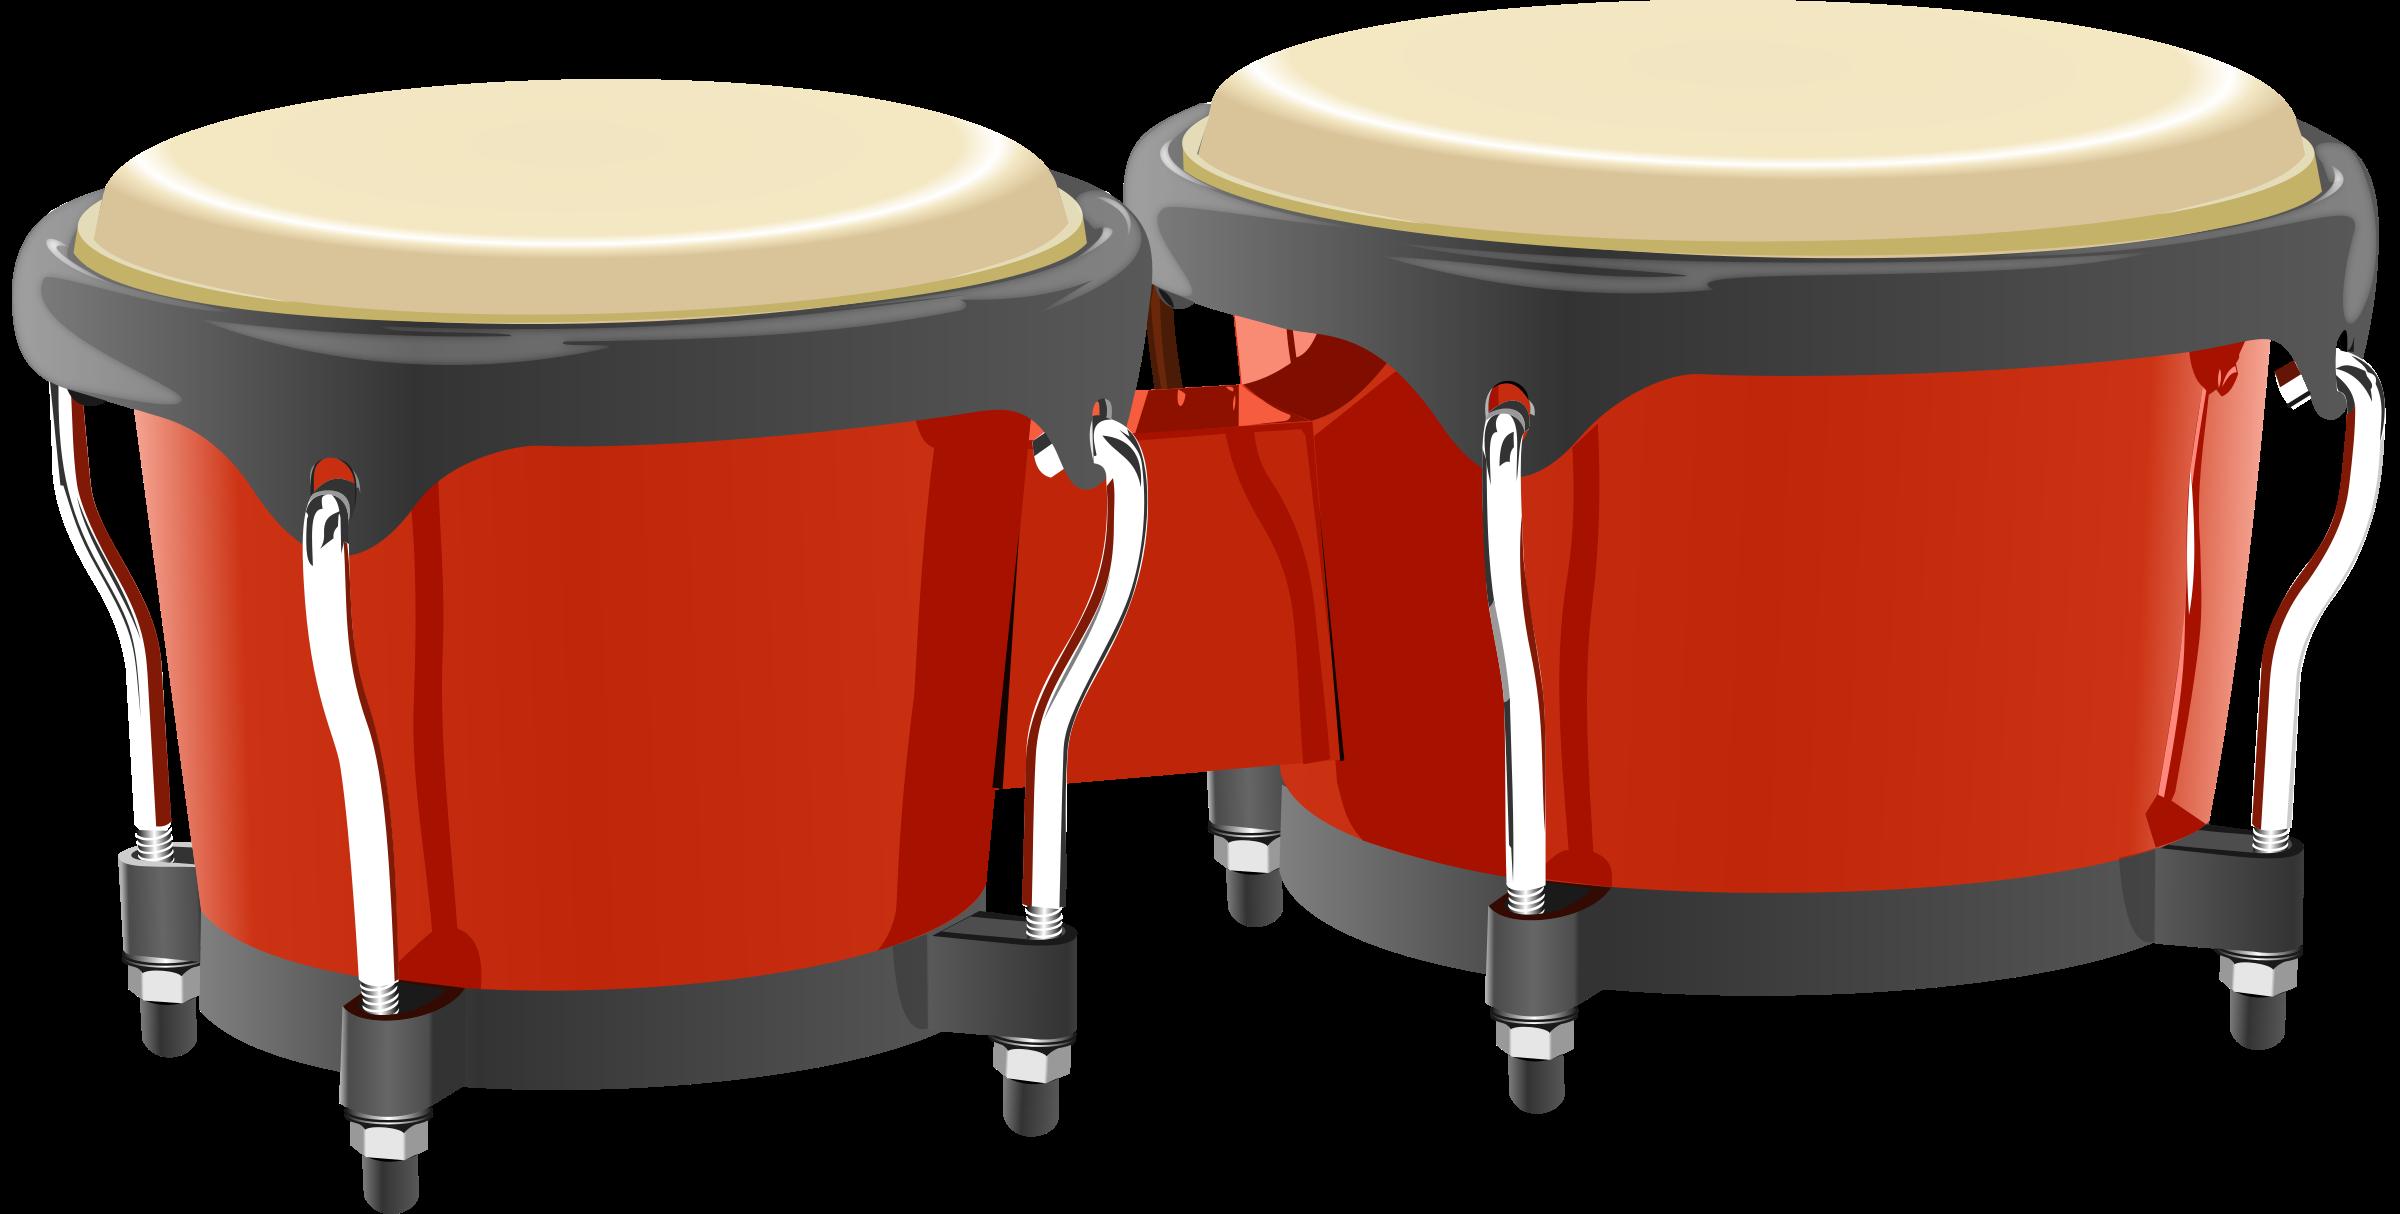 Bongos big image png. Drum clipart drums bongo